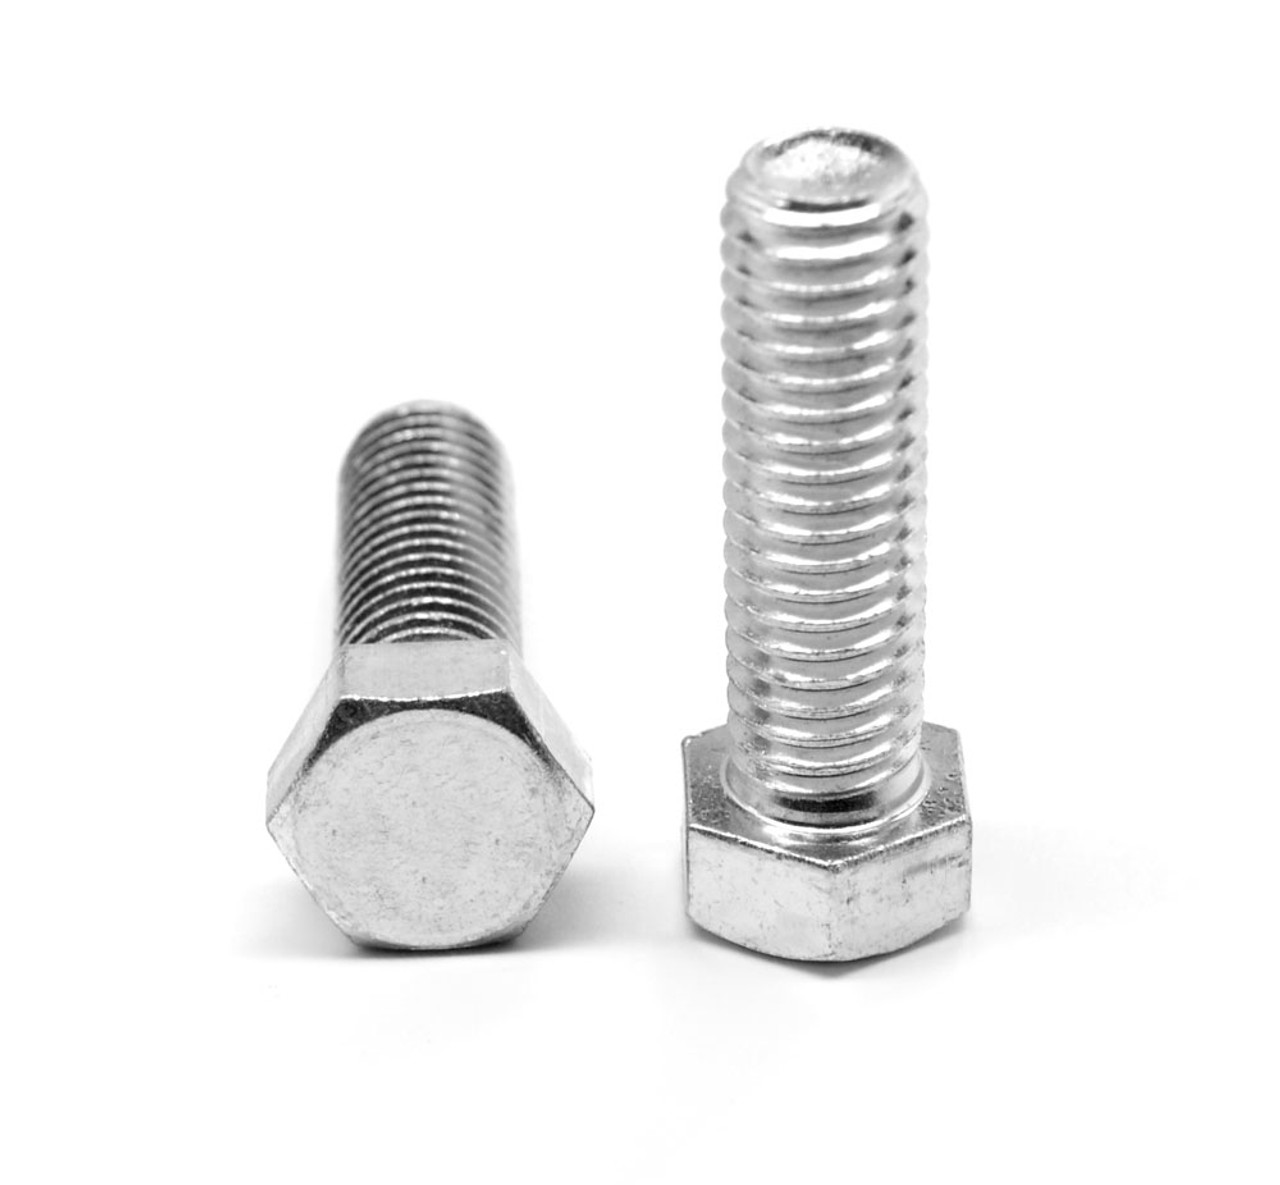 M24 x 3.00 x 45 MM (FT) Coarse Thread DIN 933 Hex Cap Screw (Bolt) Stainless Steel 18-8